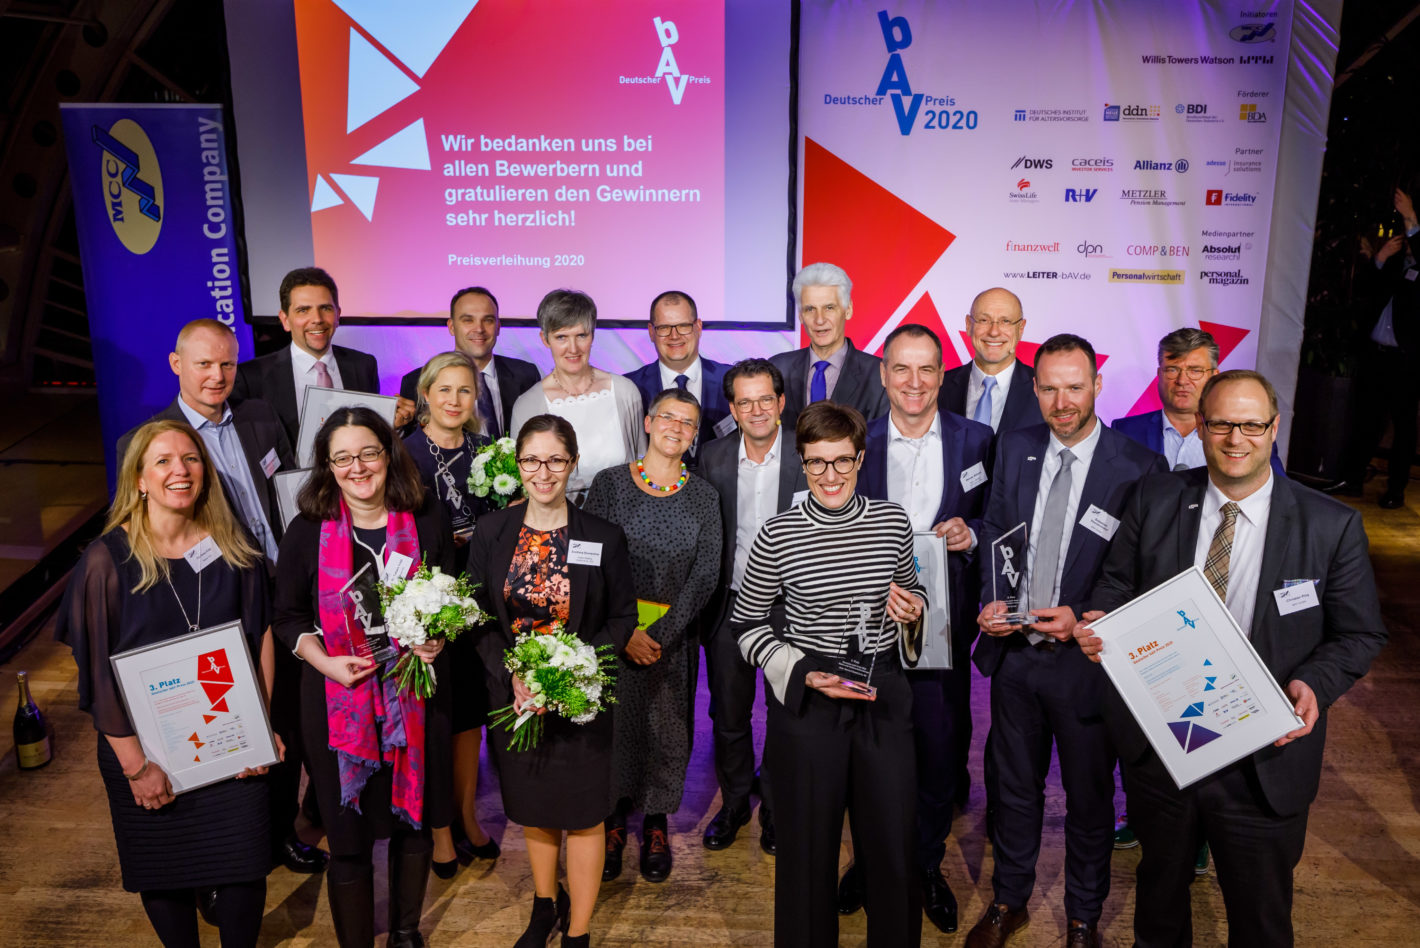 bAV-Preis 2020 Preisträger